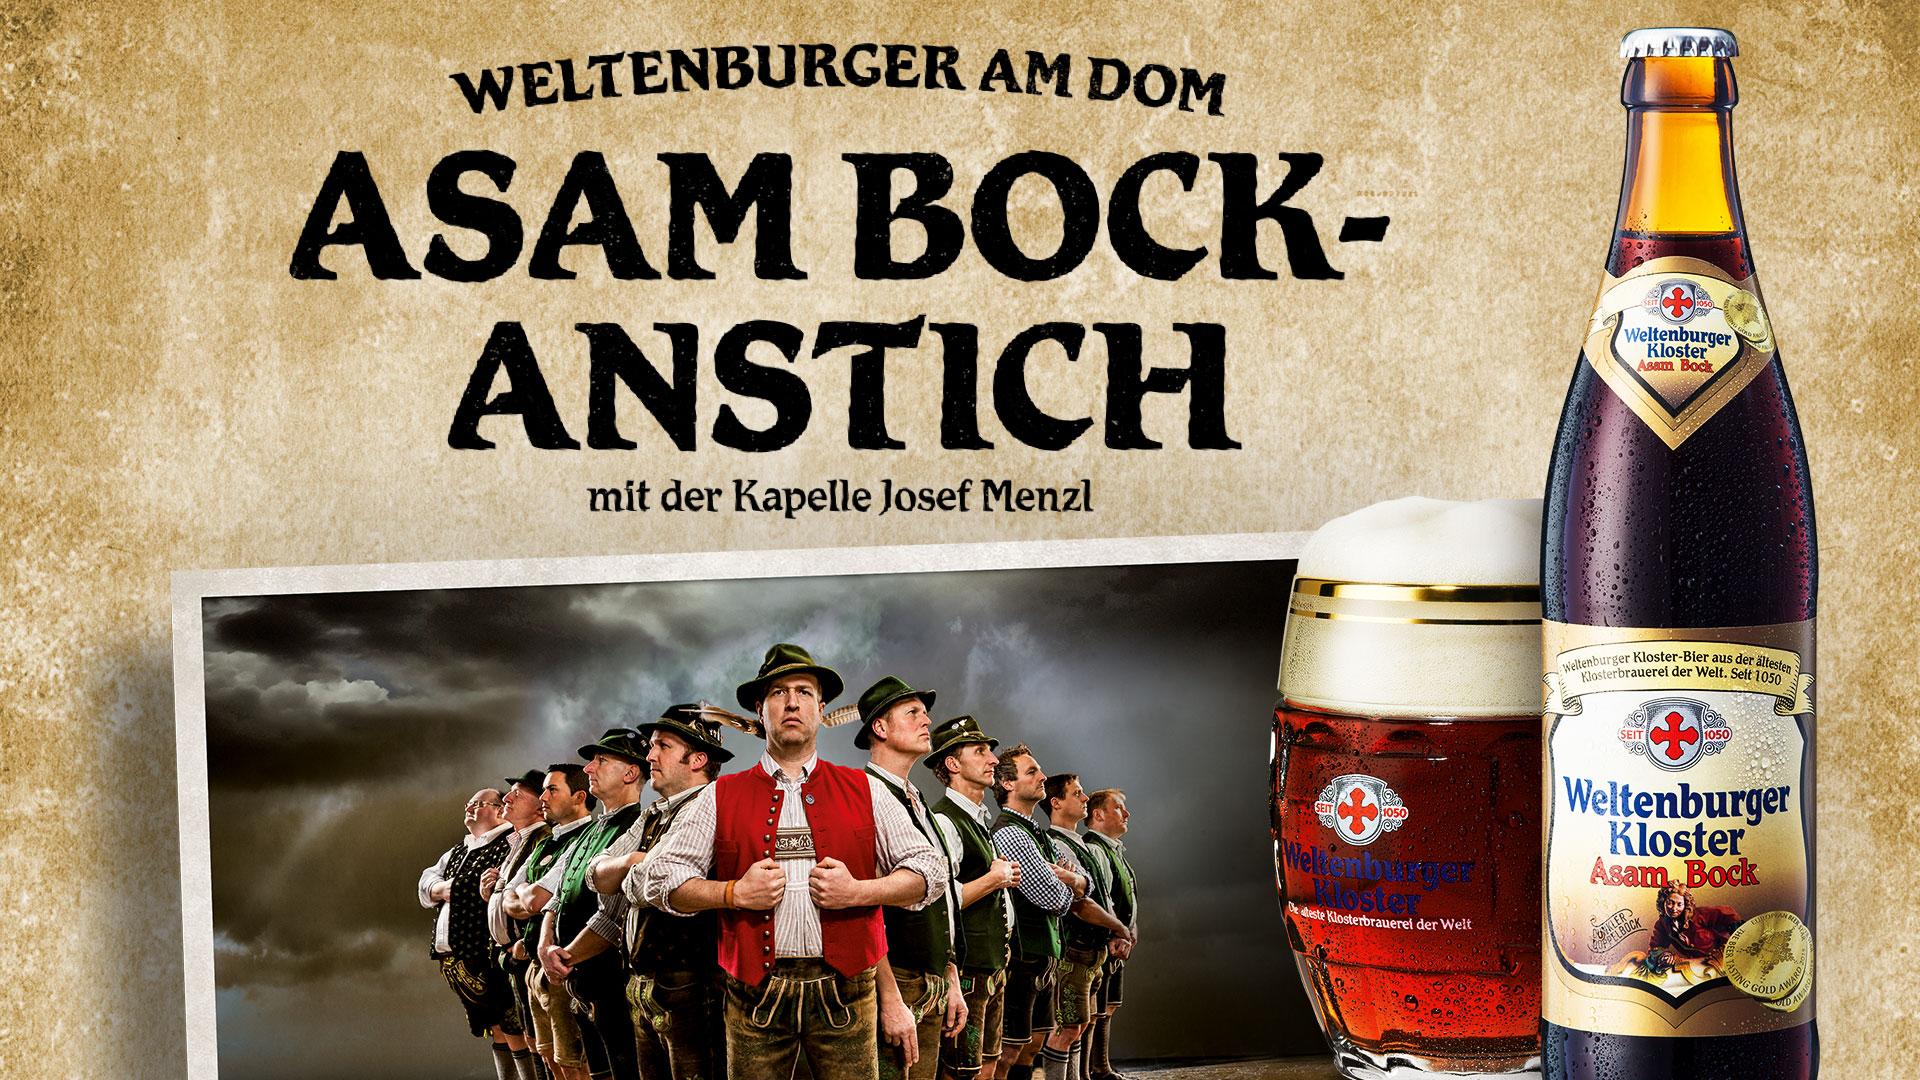 Weltenburger-Klosterbrauerei-Asambock-Bier-Anstich_01.jpg